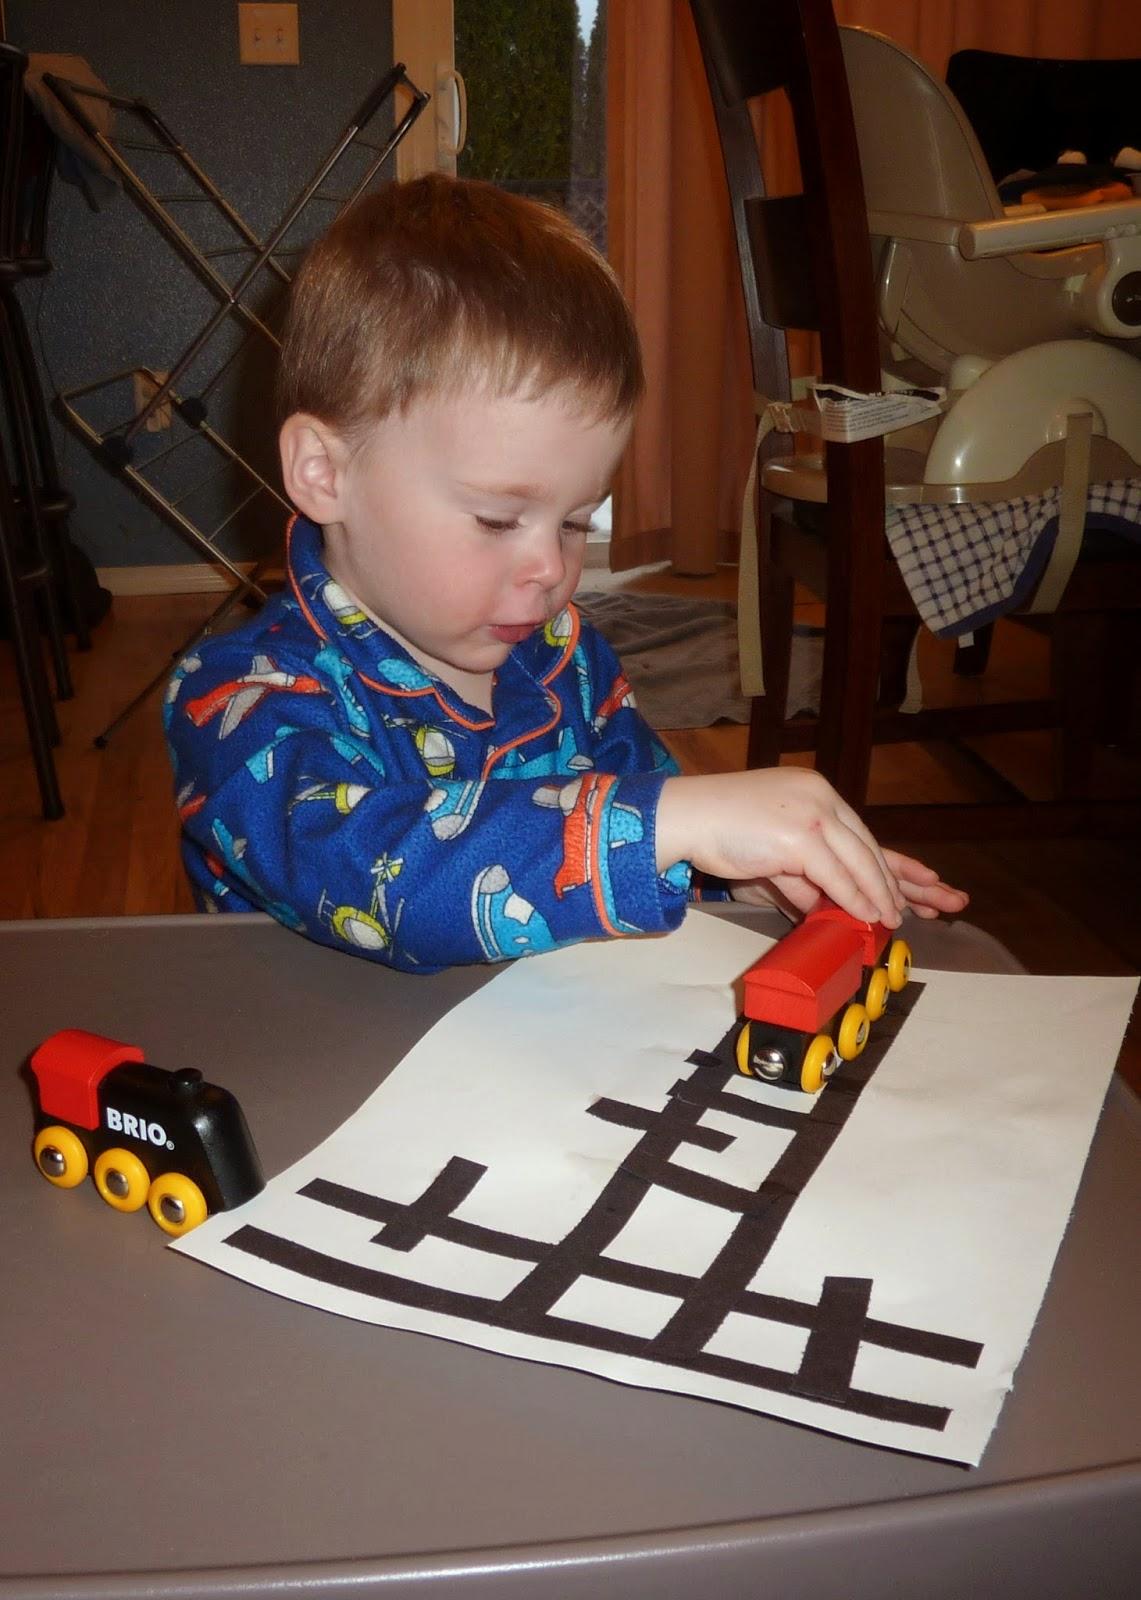 http://aztoid.blogspot.com/2014/04/tot-school-t-is-for-train.html